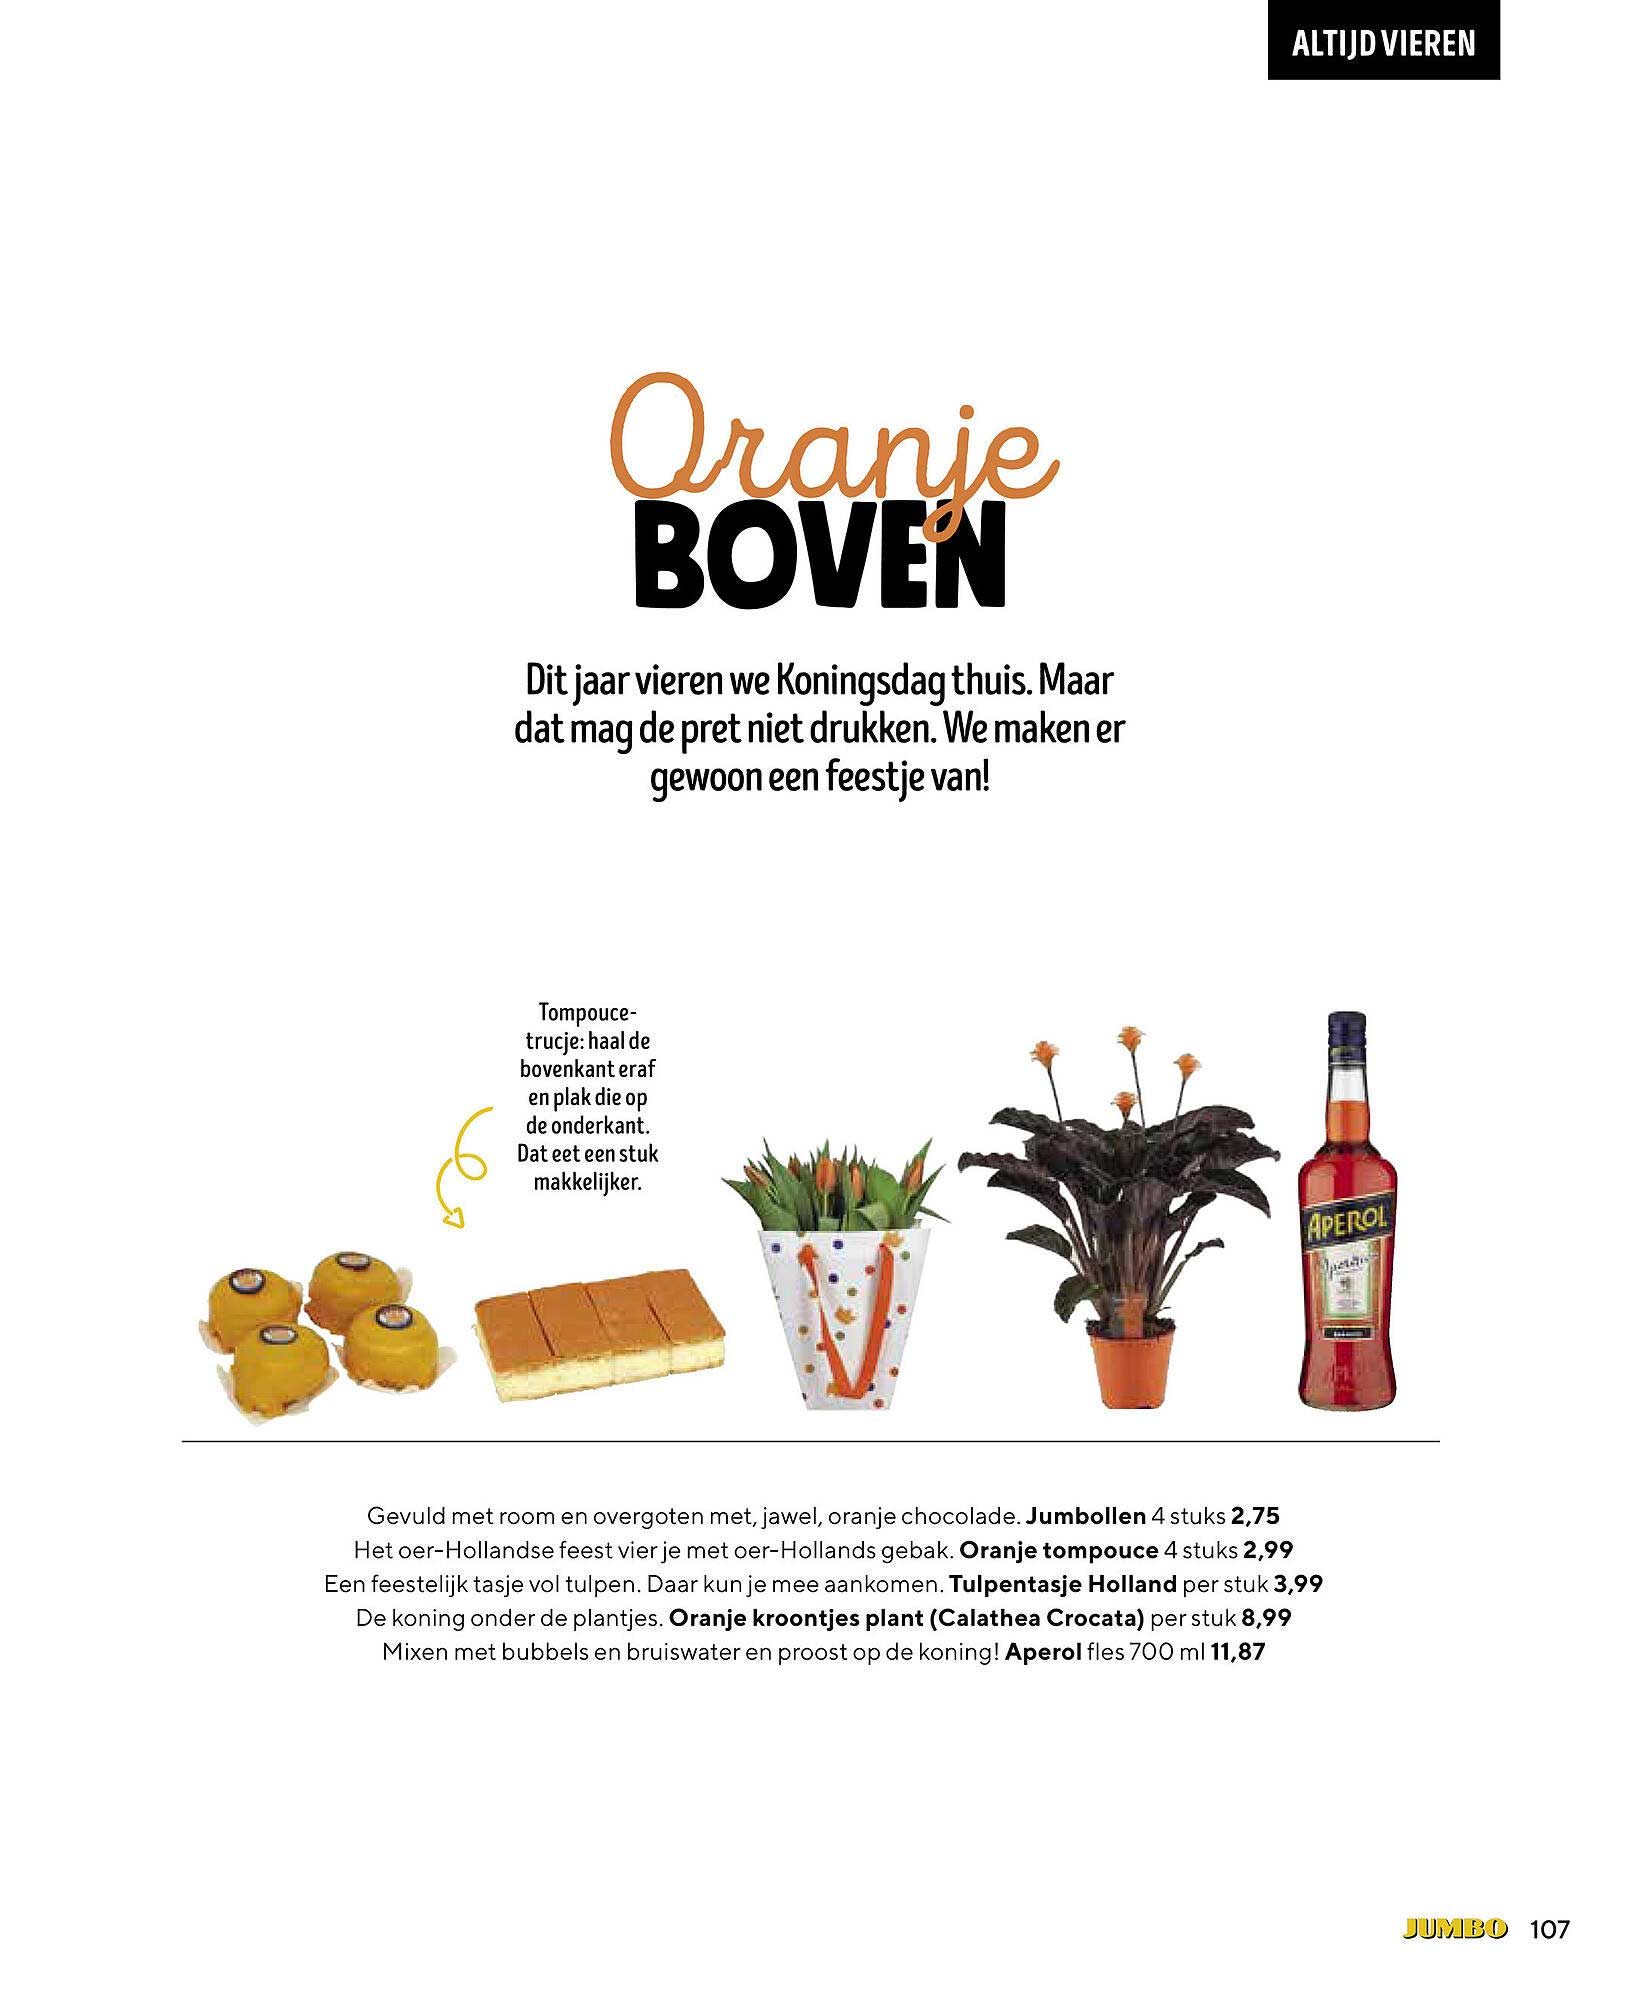 Jumbo Jumbollen, Oranje Tompouce, Tulpentasje Holland, Oranje Kroontjes Plant (Calathea Crocata) Of Aperol